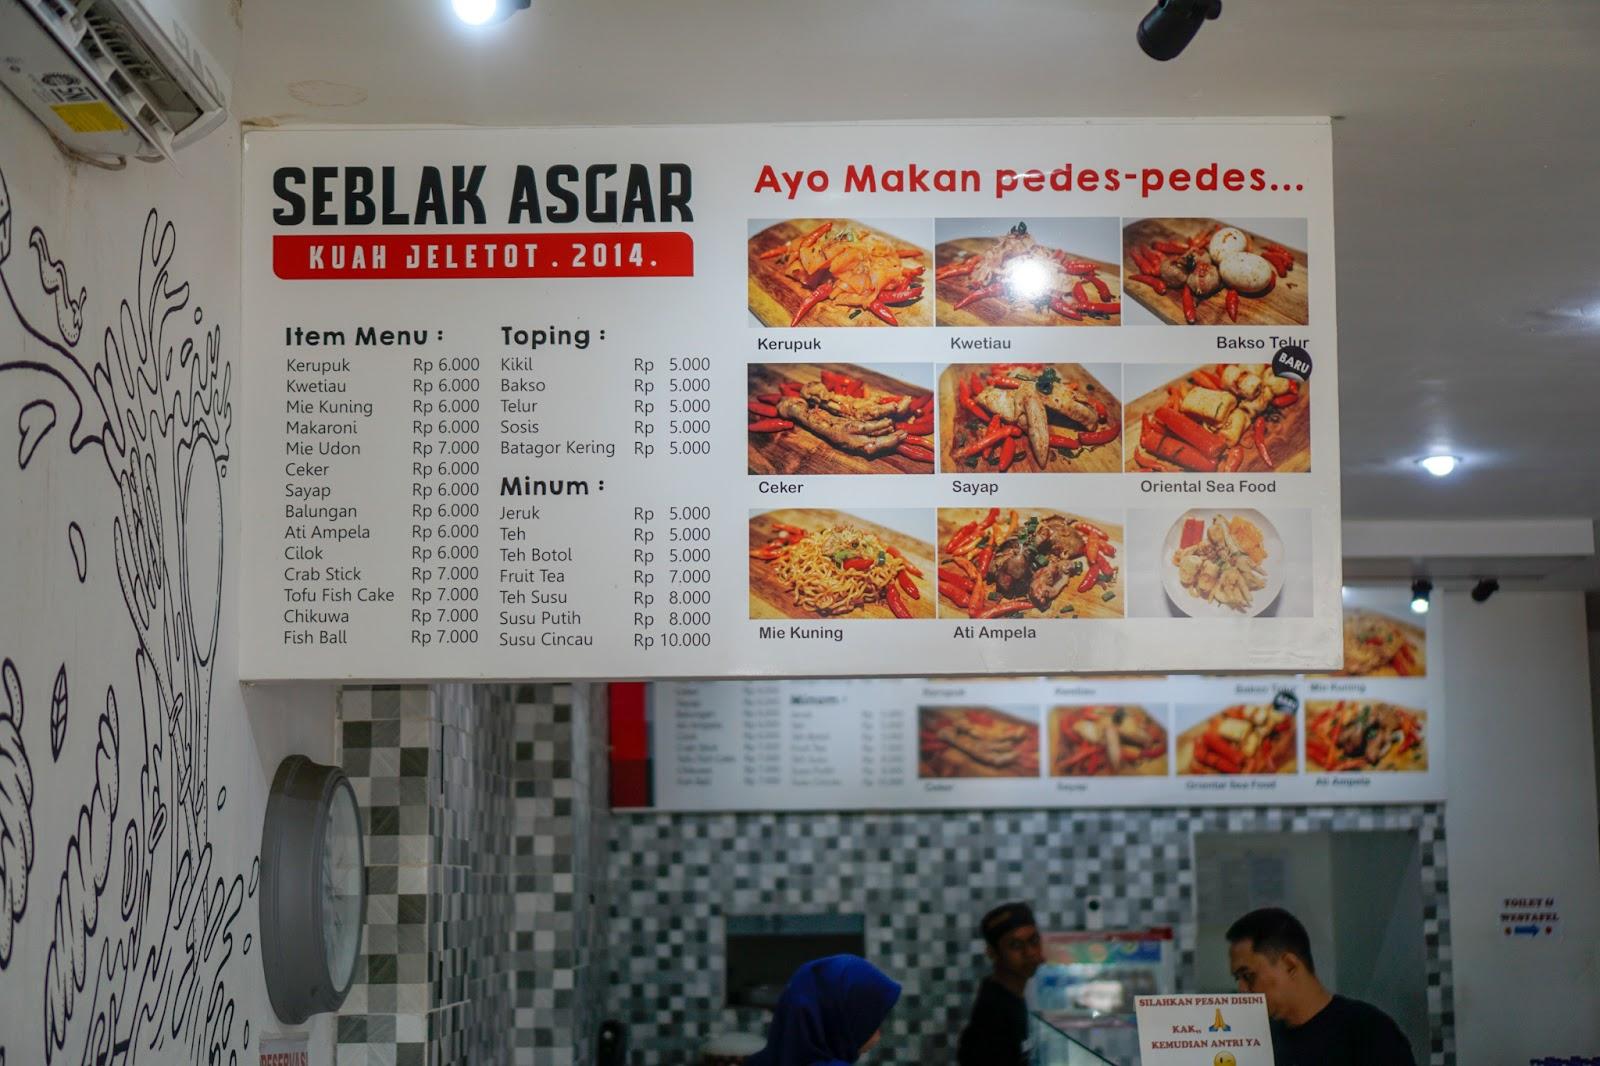 Seblak Asgar Sensasi Pedas Kuliner Garut Di Yogyakarta Ardian Kusuma